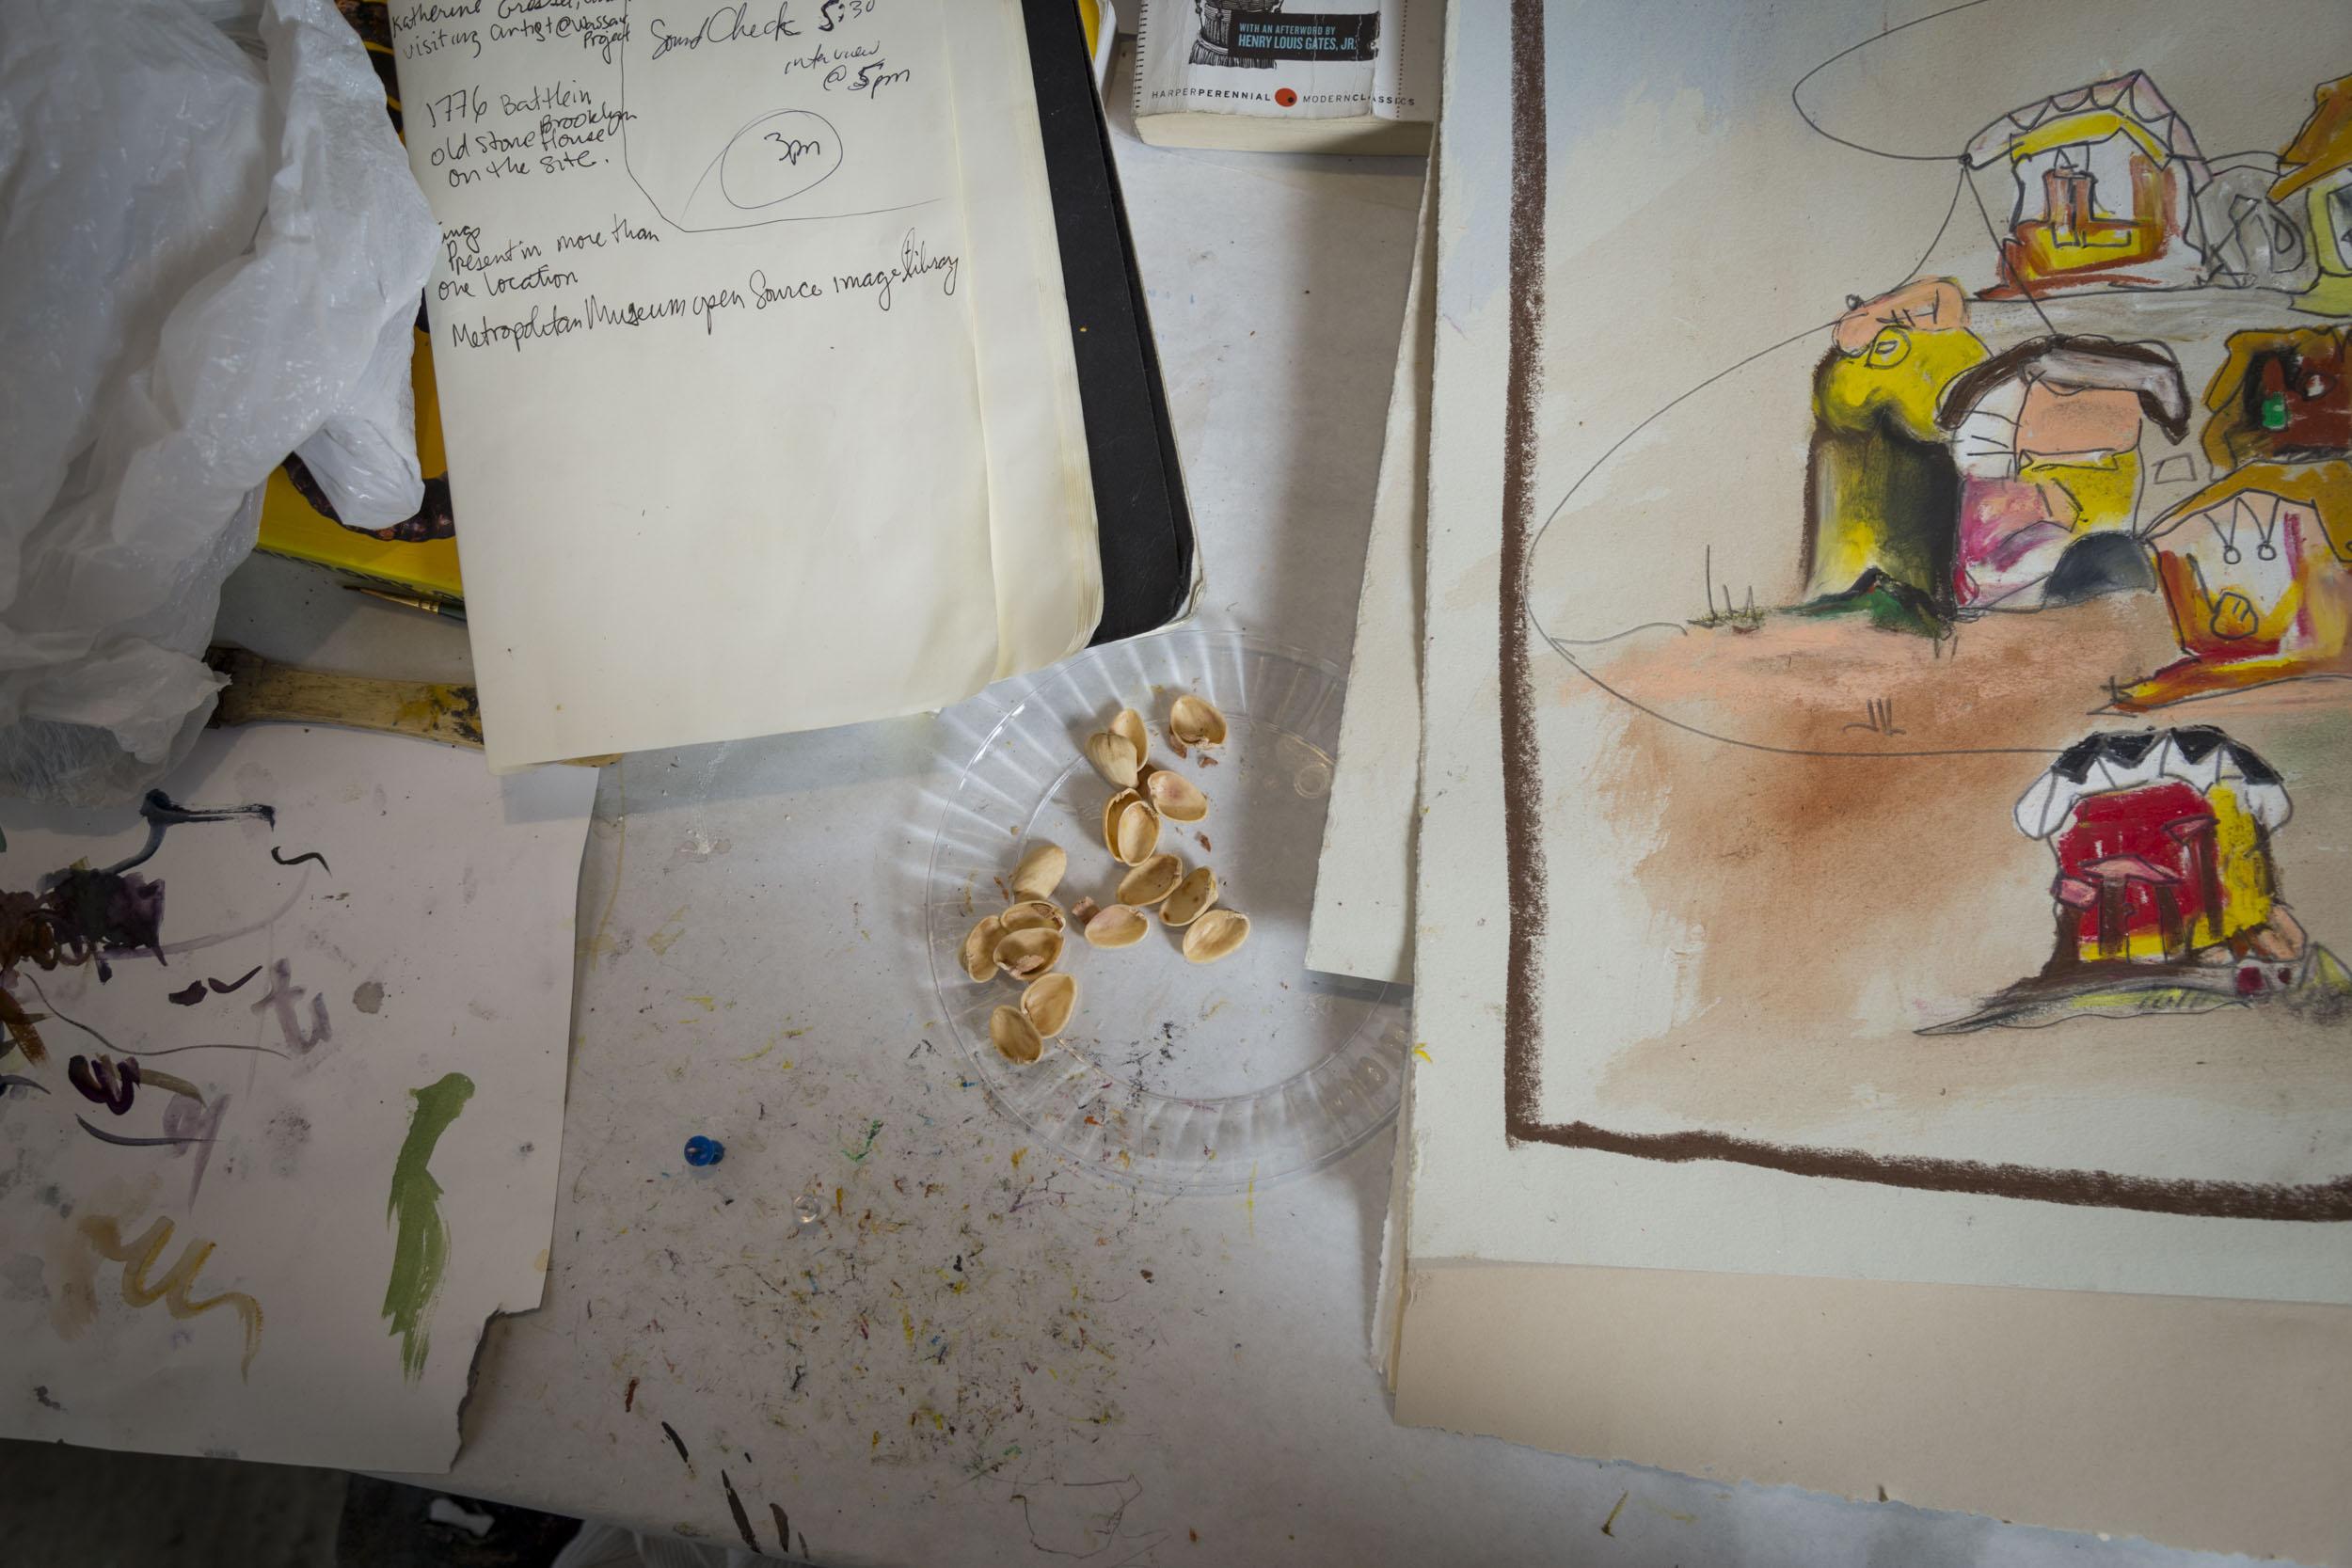 wassaic-project-artist-nyugen-smith-2018-07-24-15-30-18.jpg